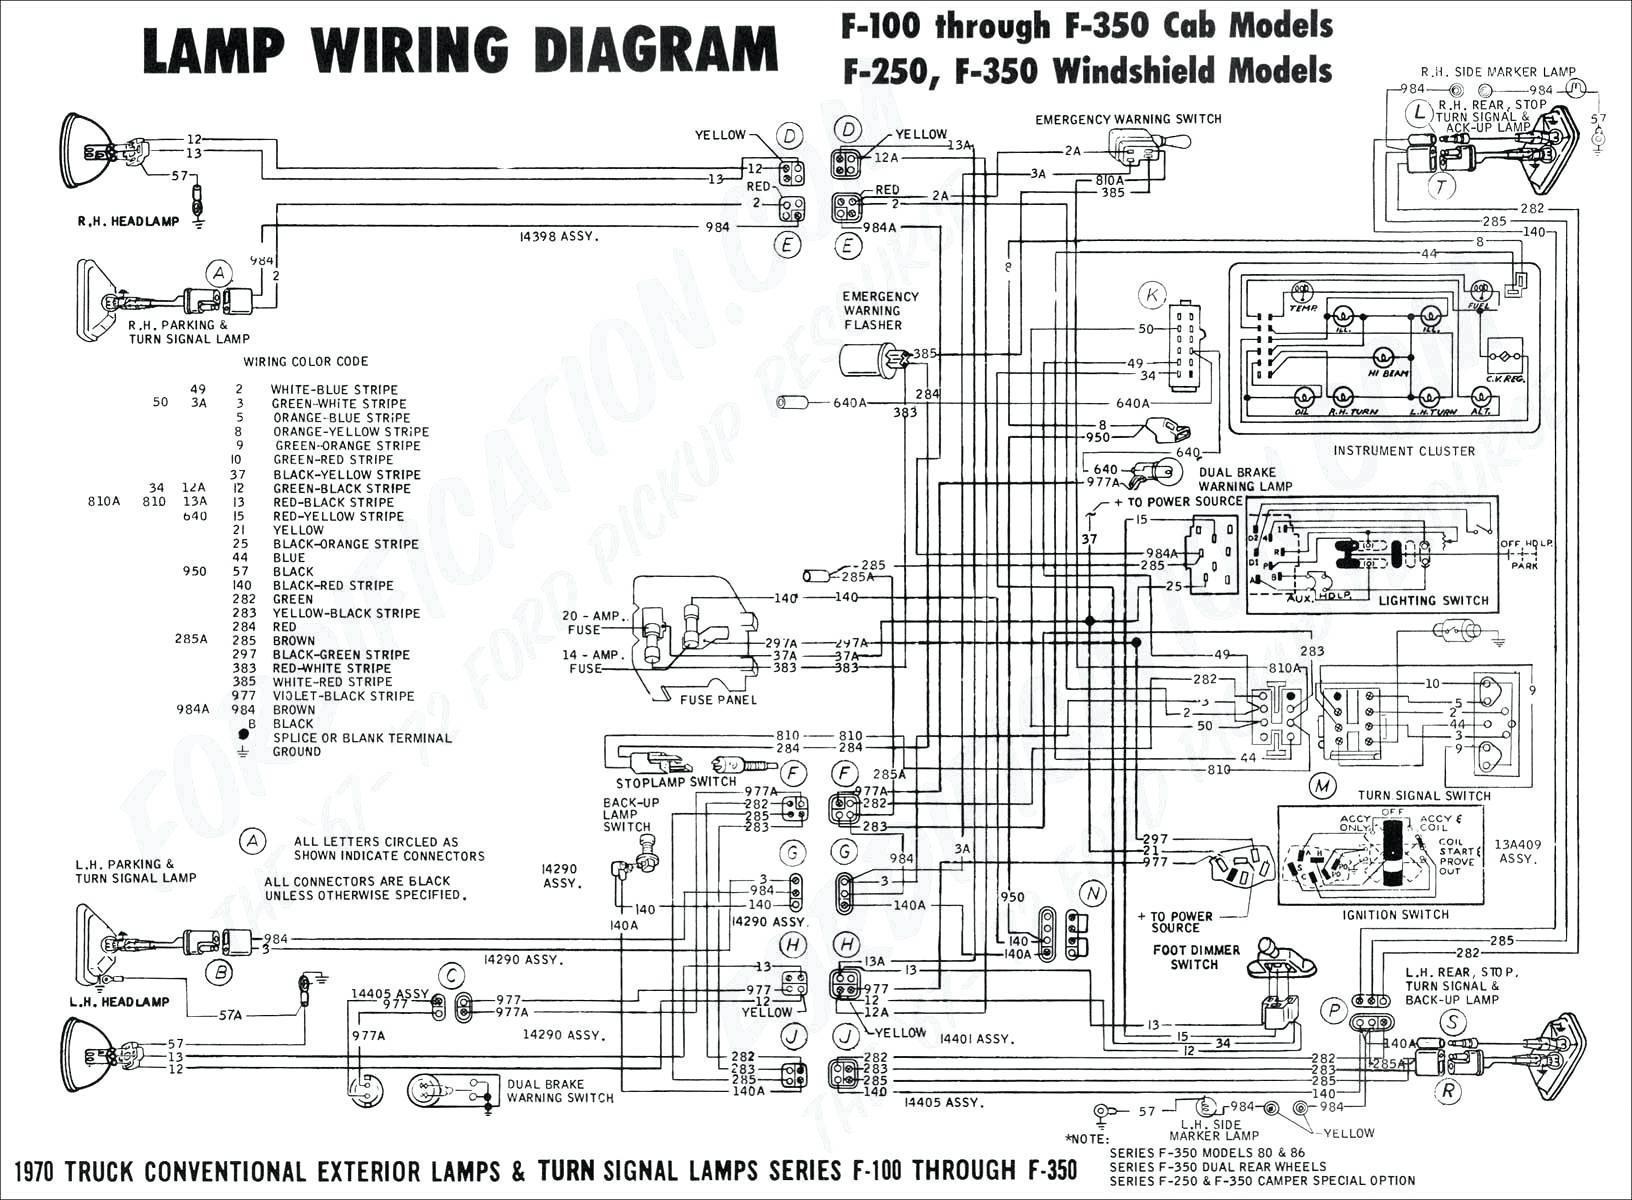 Boat Trailer Wiring Diagram 4 Way Boat Trailer Plug Wiring Diagram Trusted Schematics Diagram Of Boat Trailer Wiring Diagram 4 Way